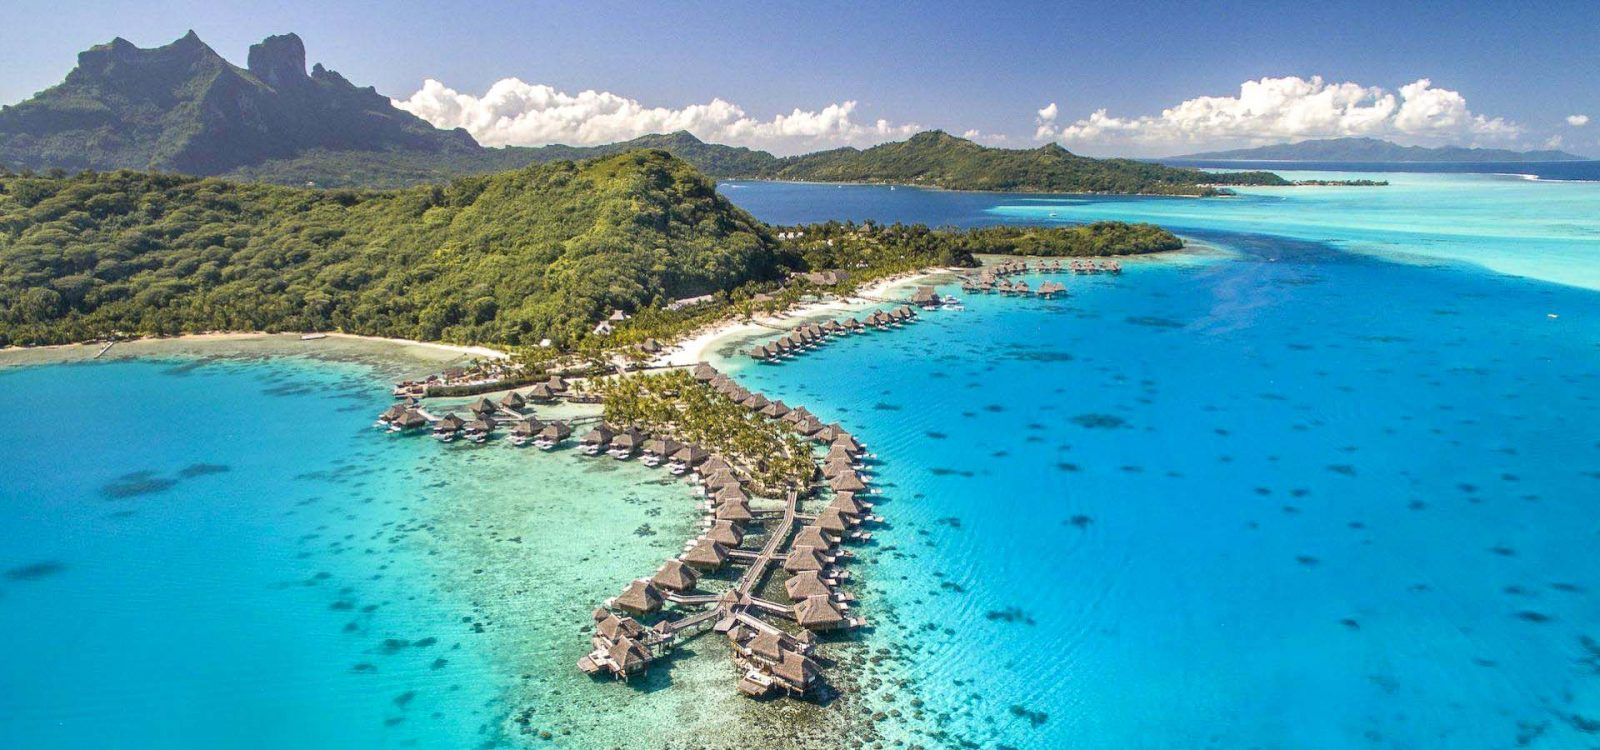 Conrad Bora Bora bungalow sur pilotis - FMR blog voyage